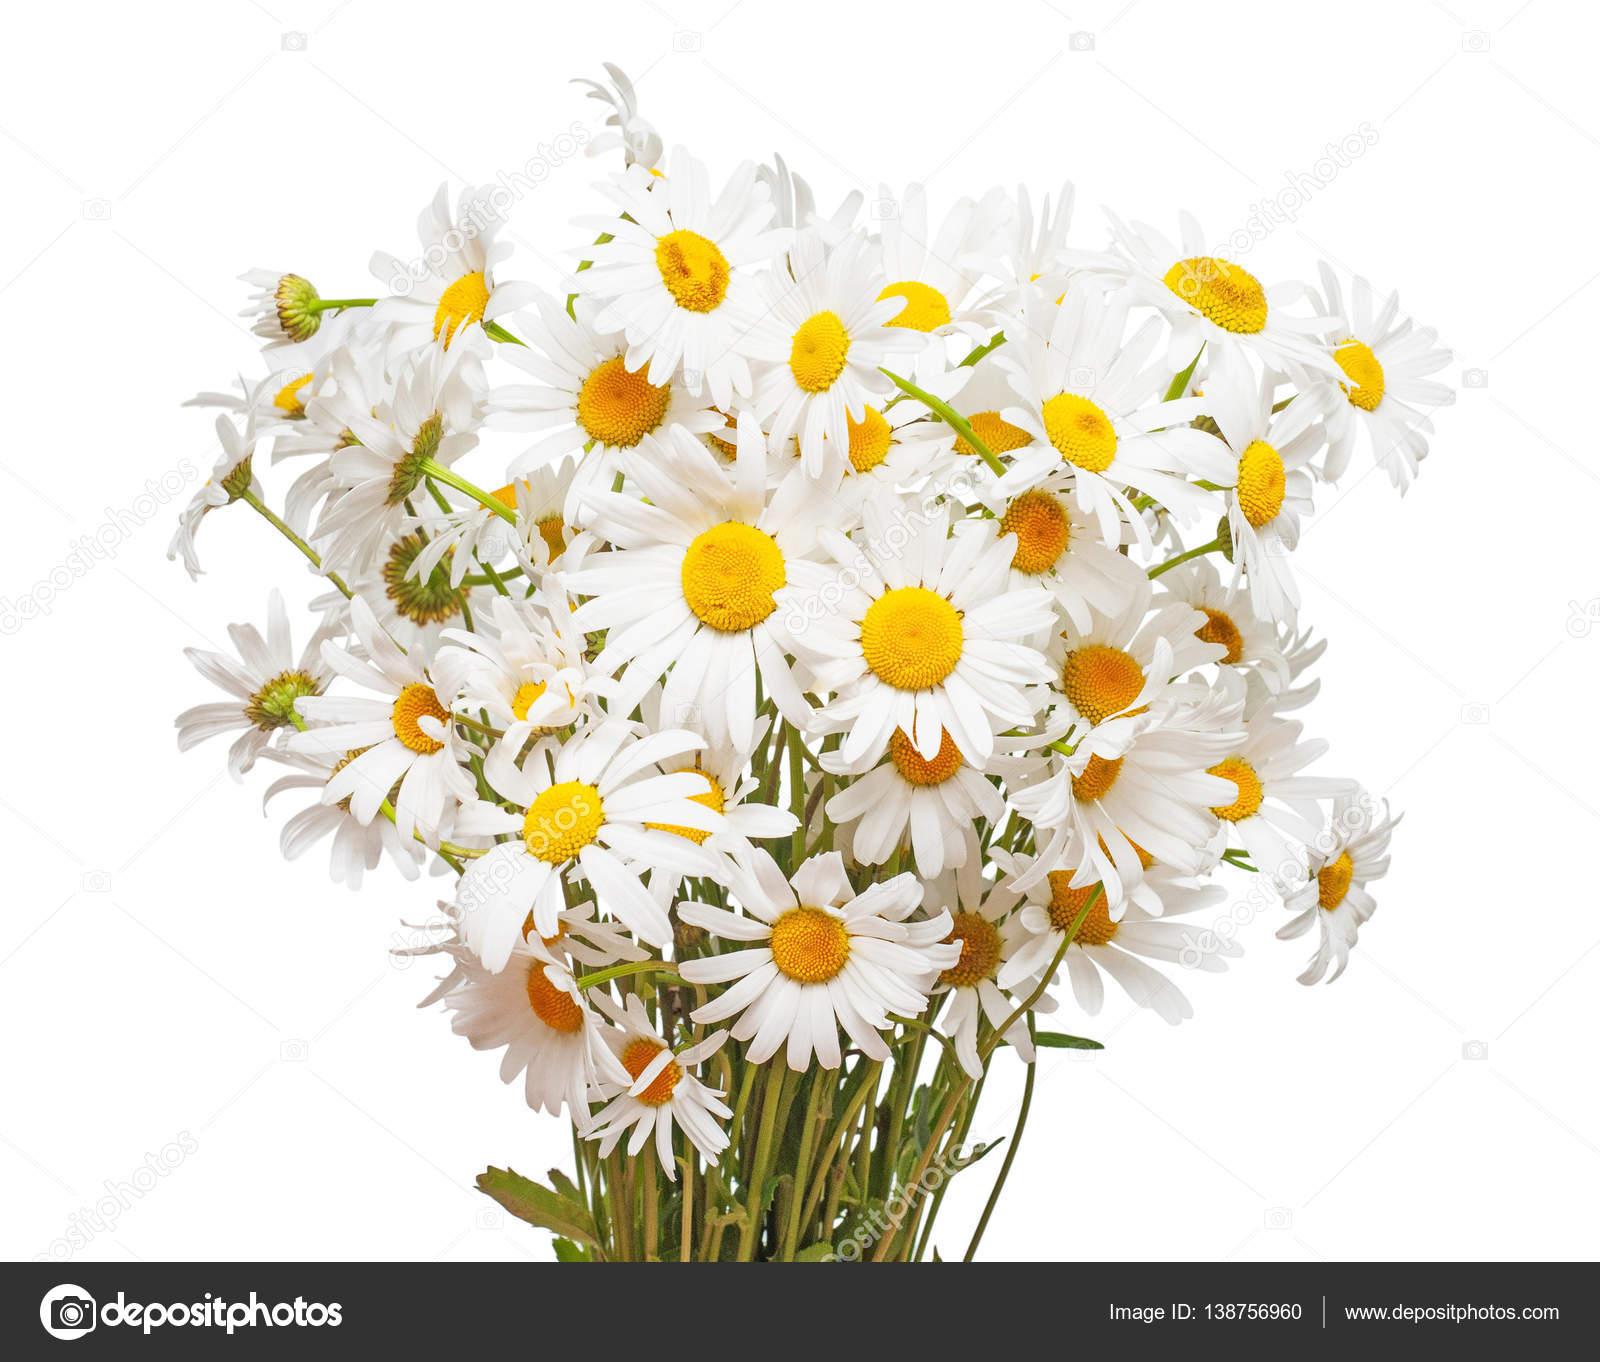 https://st3.depositphotos.com/6084264/13875/i/1600/depositphotos_138756960-stock-photo-bouquet-of-large-white-daisies.jpg